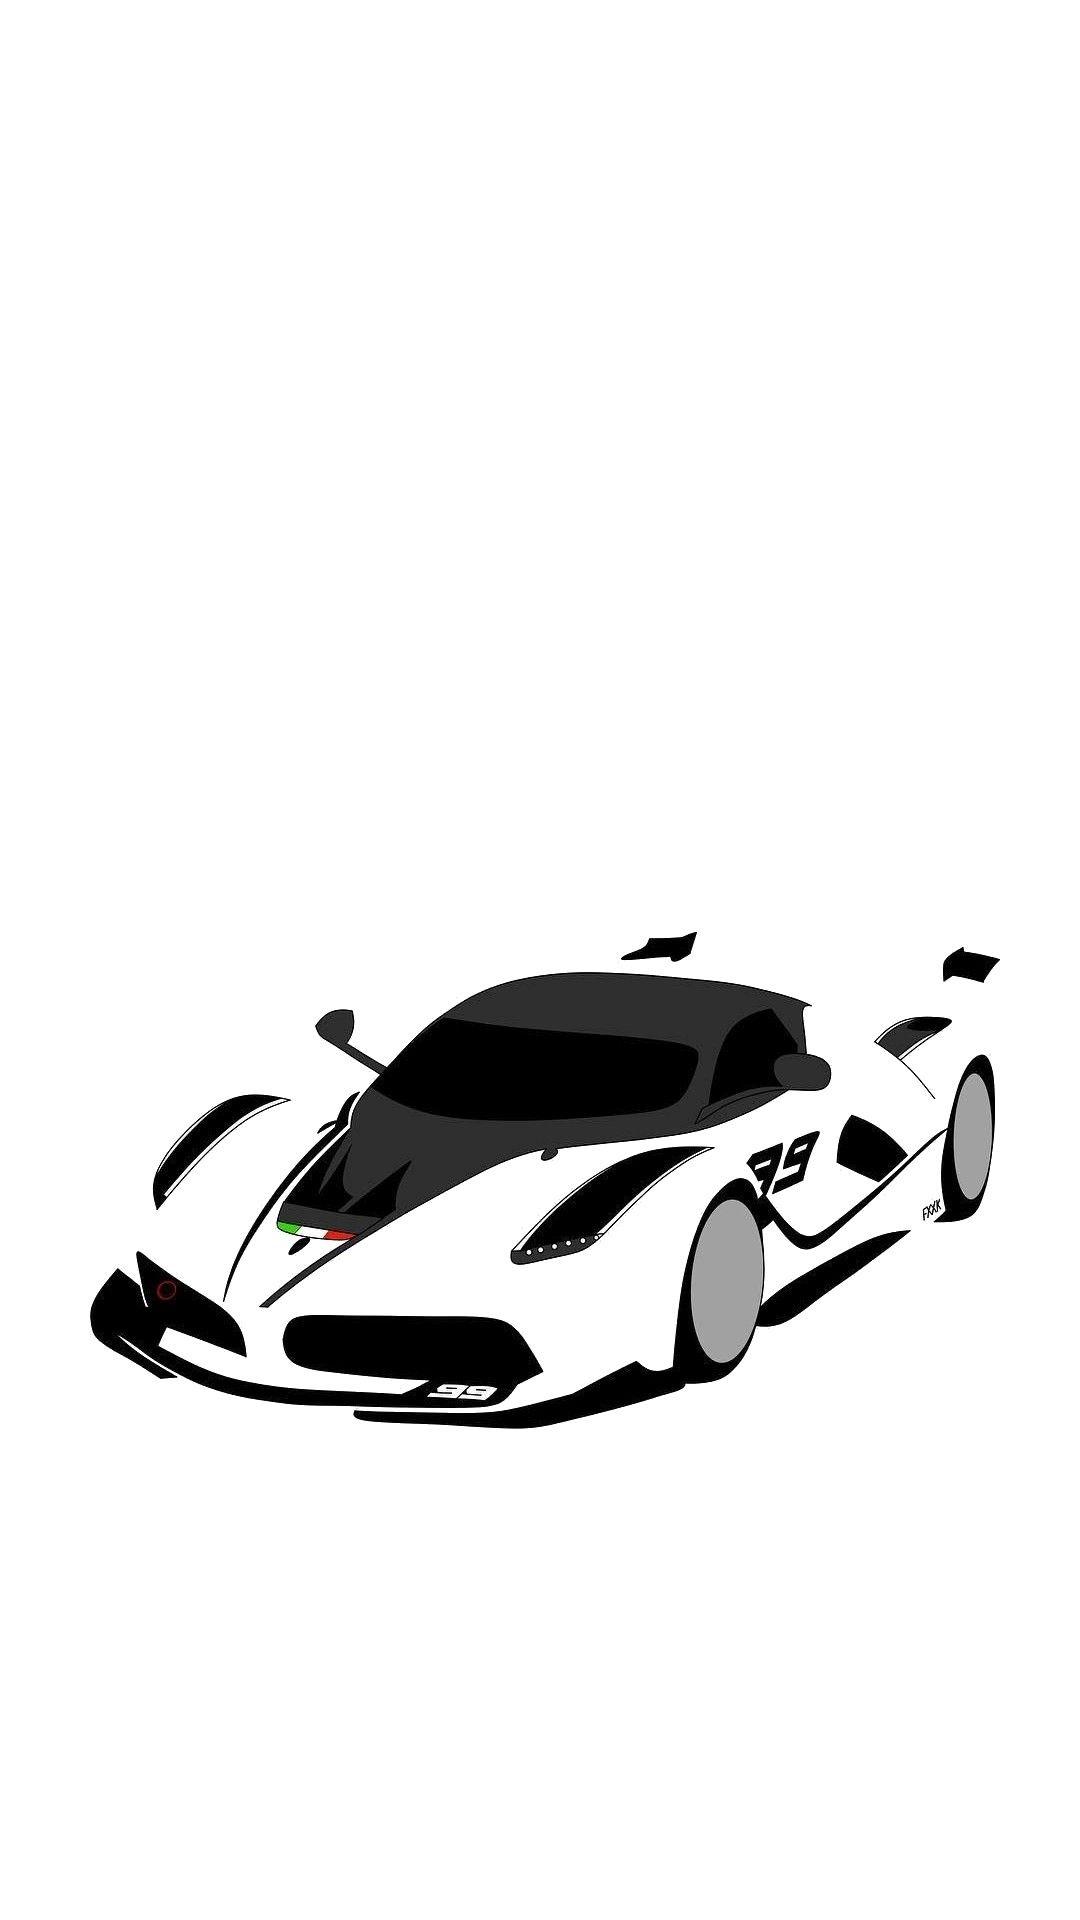 Pin By Gnswo On Jdm Car Sports Car Wallpaper Art Cars Automotive Artwork